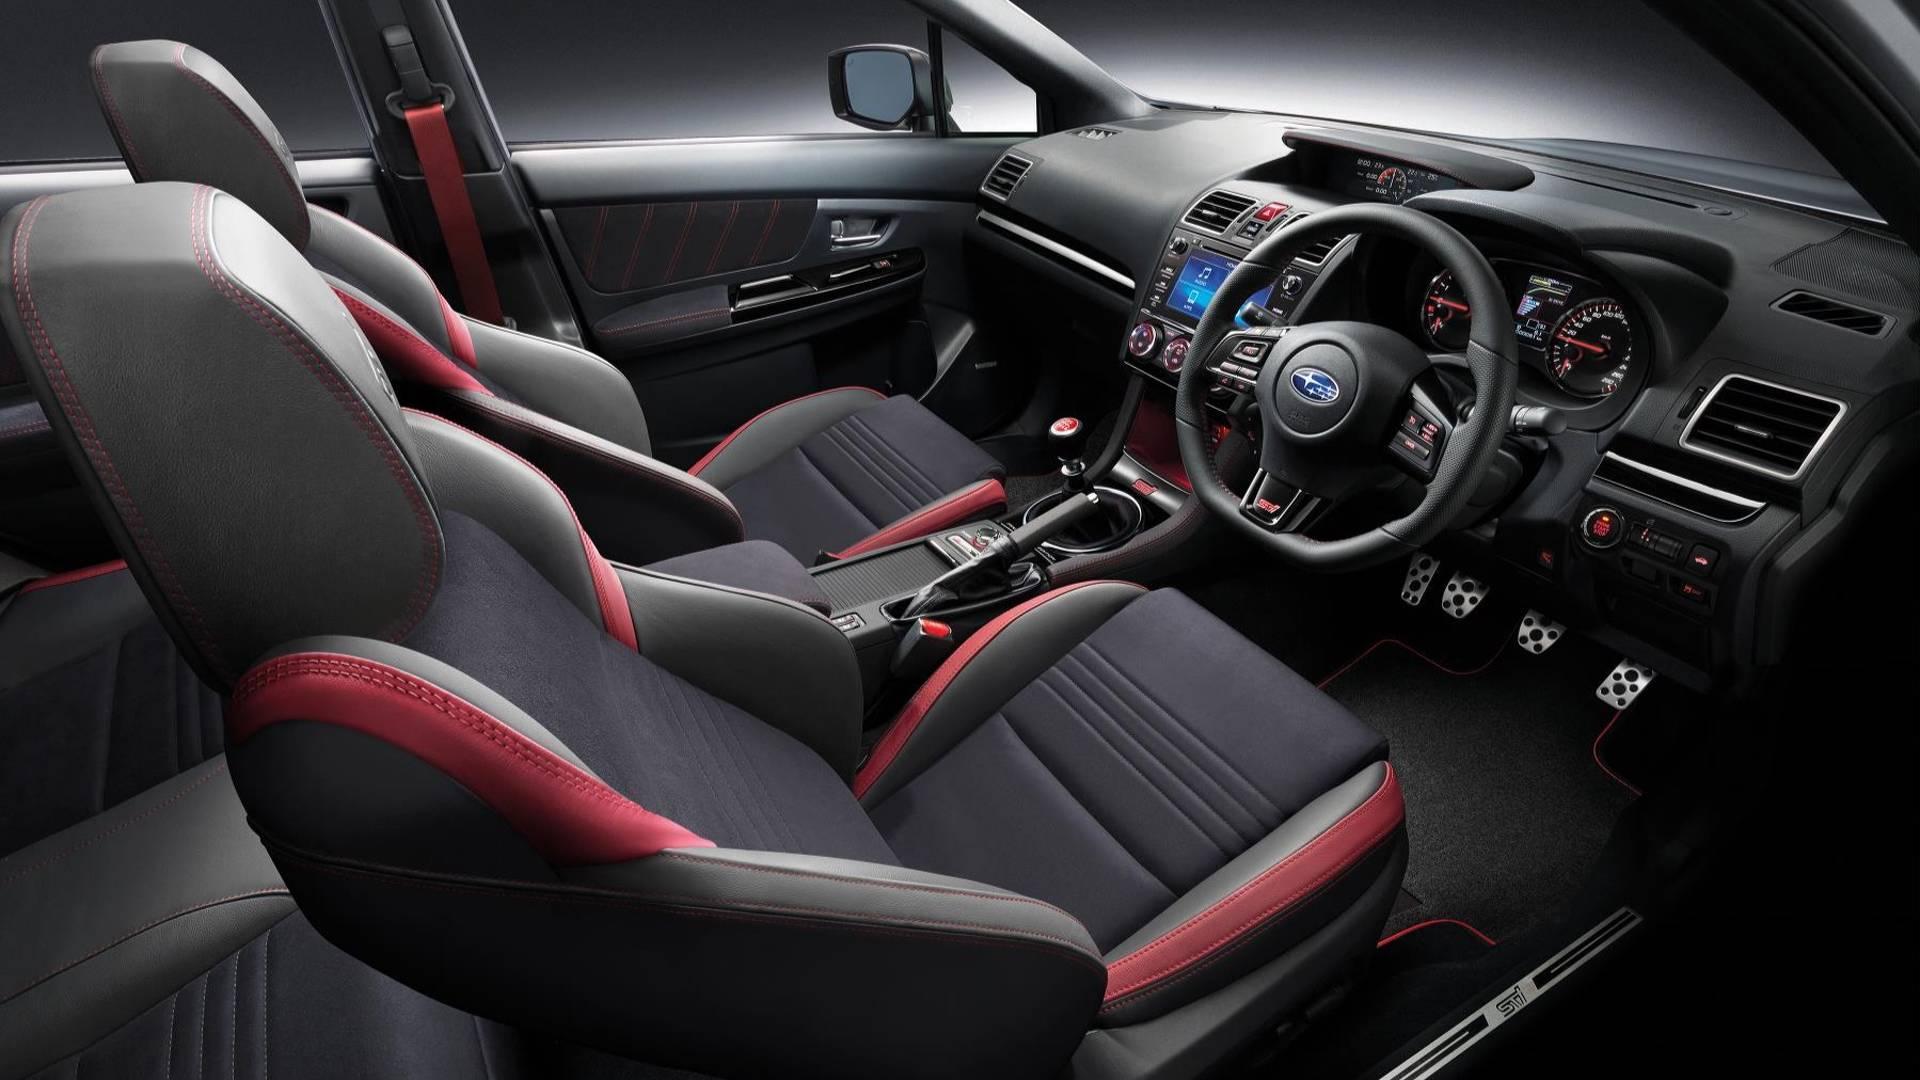 2019 Subaru Wrx And Wrx Sti Pricing Increased Series Grey Announced